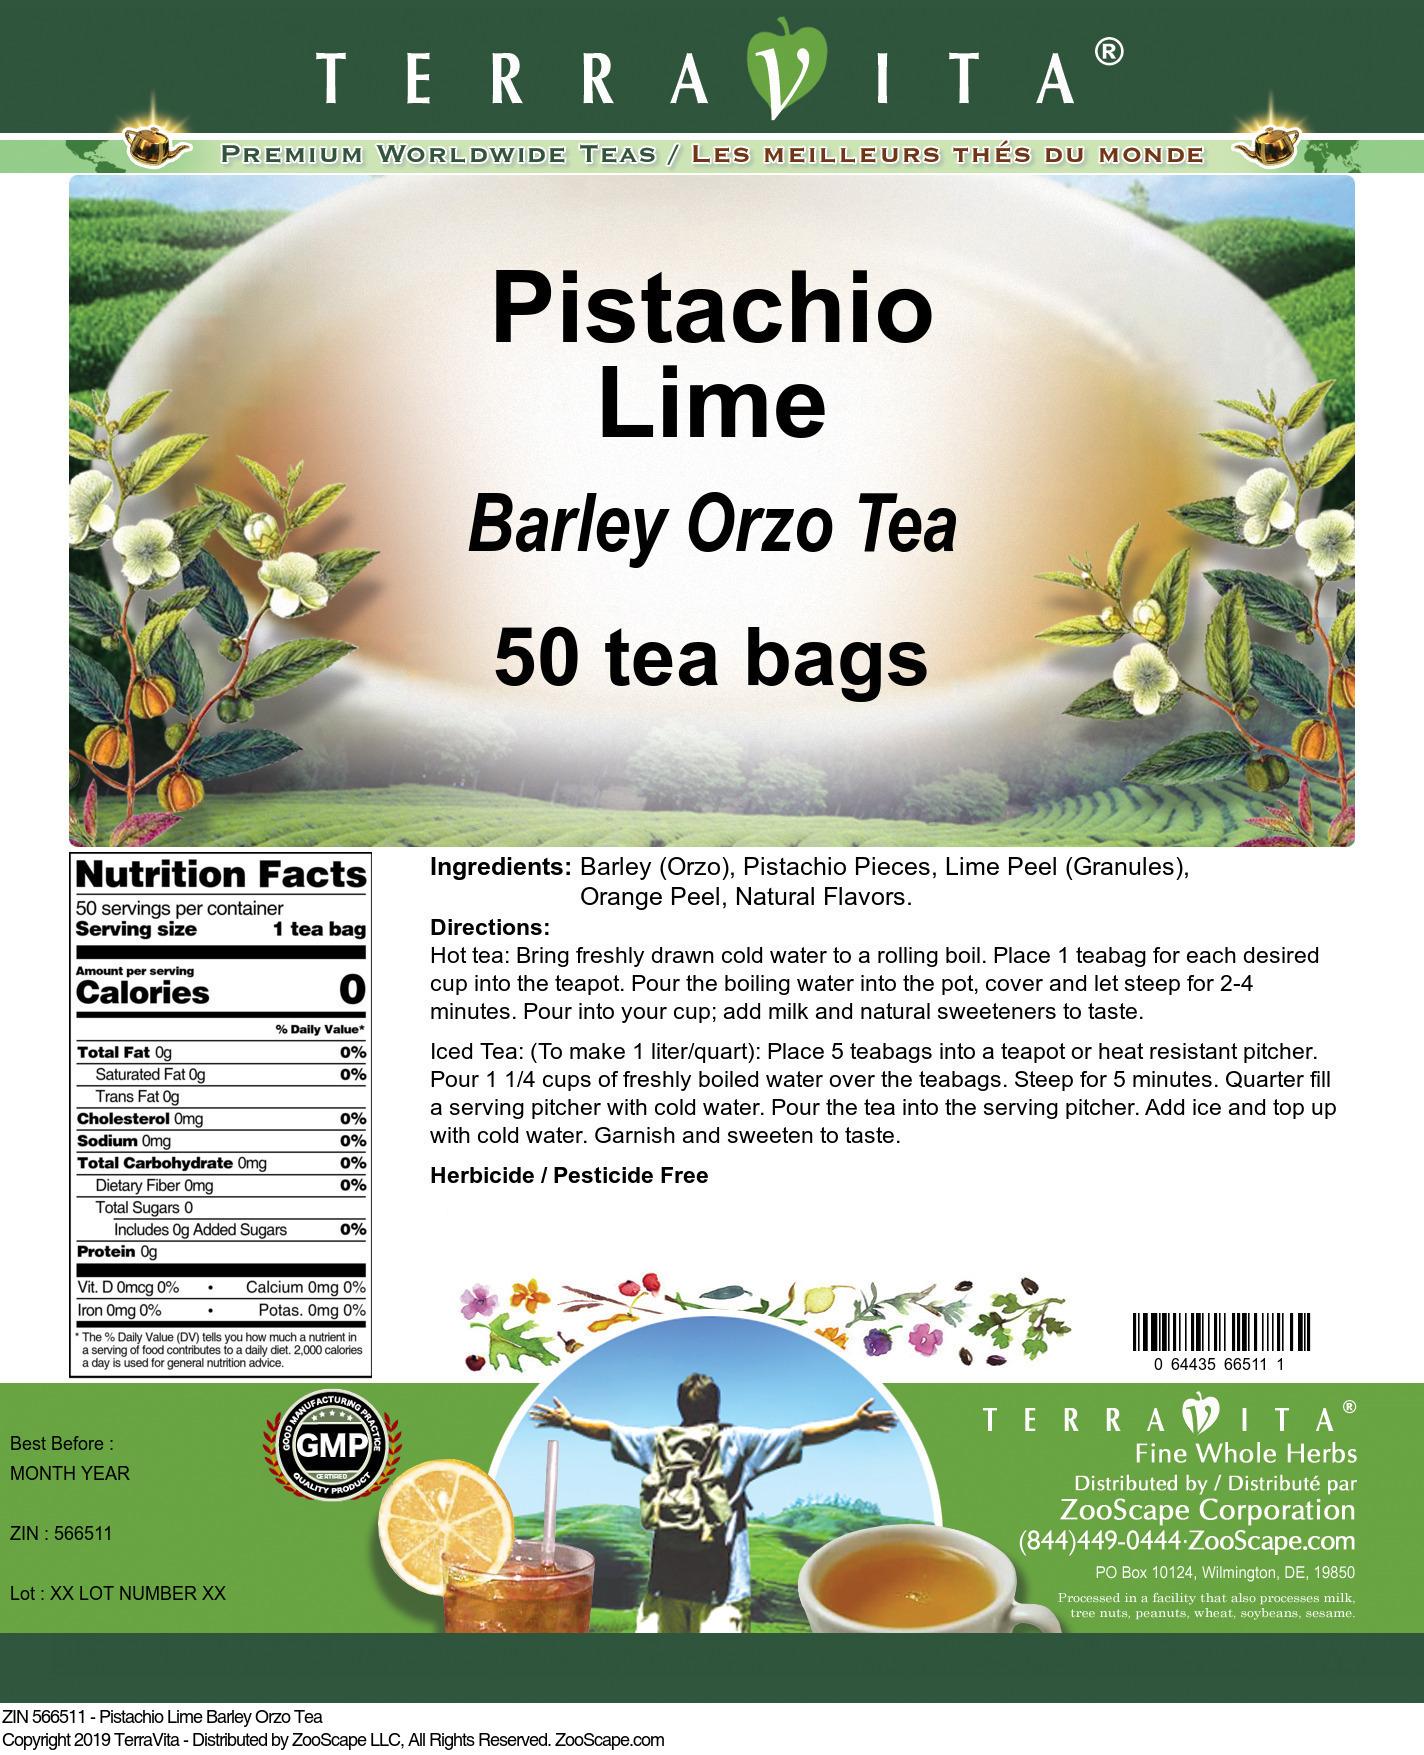 Pistachio Lime Barley Orzo Tea